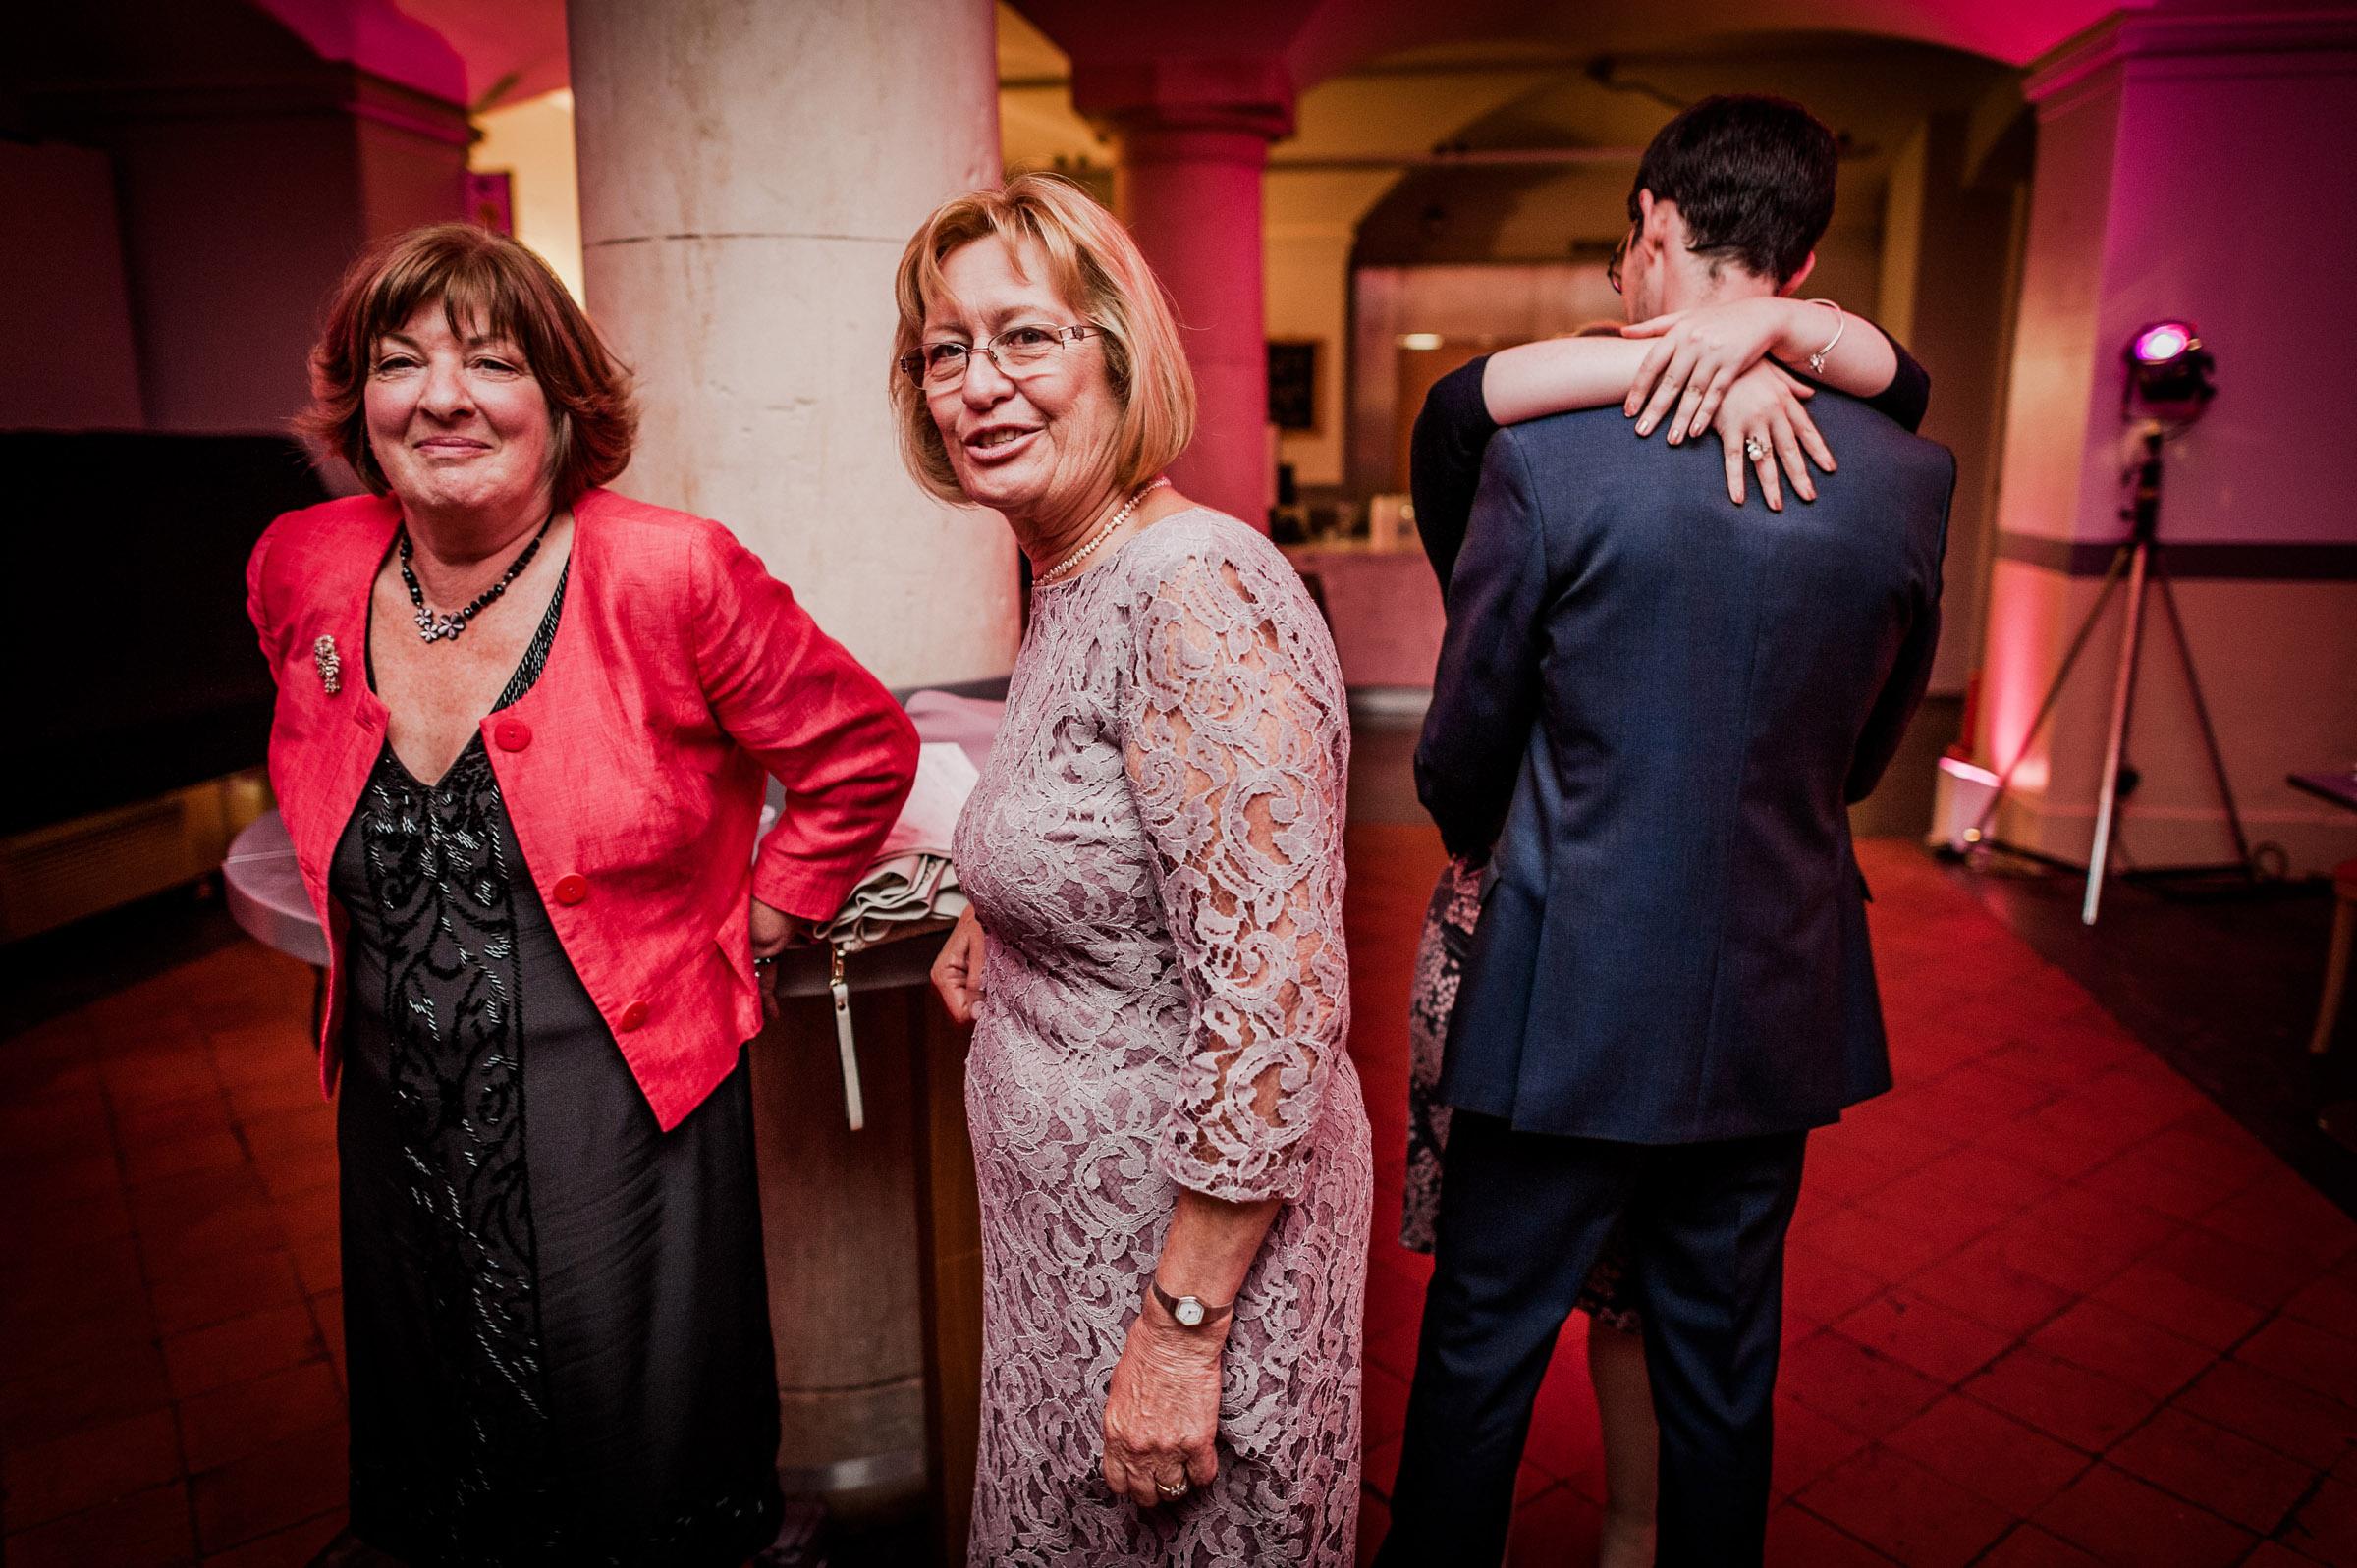 Ashmolean-Museum-Wedding-Pictures-0073.jpg